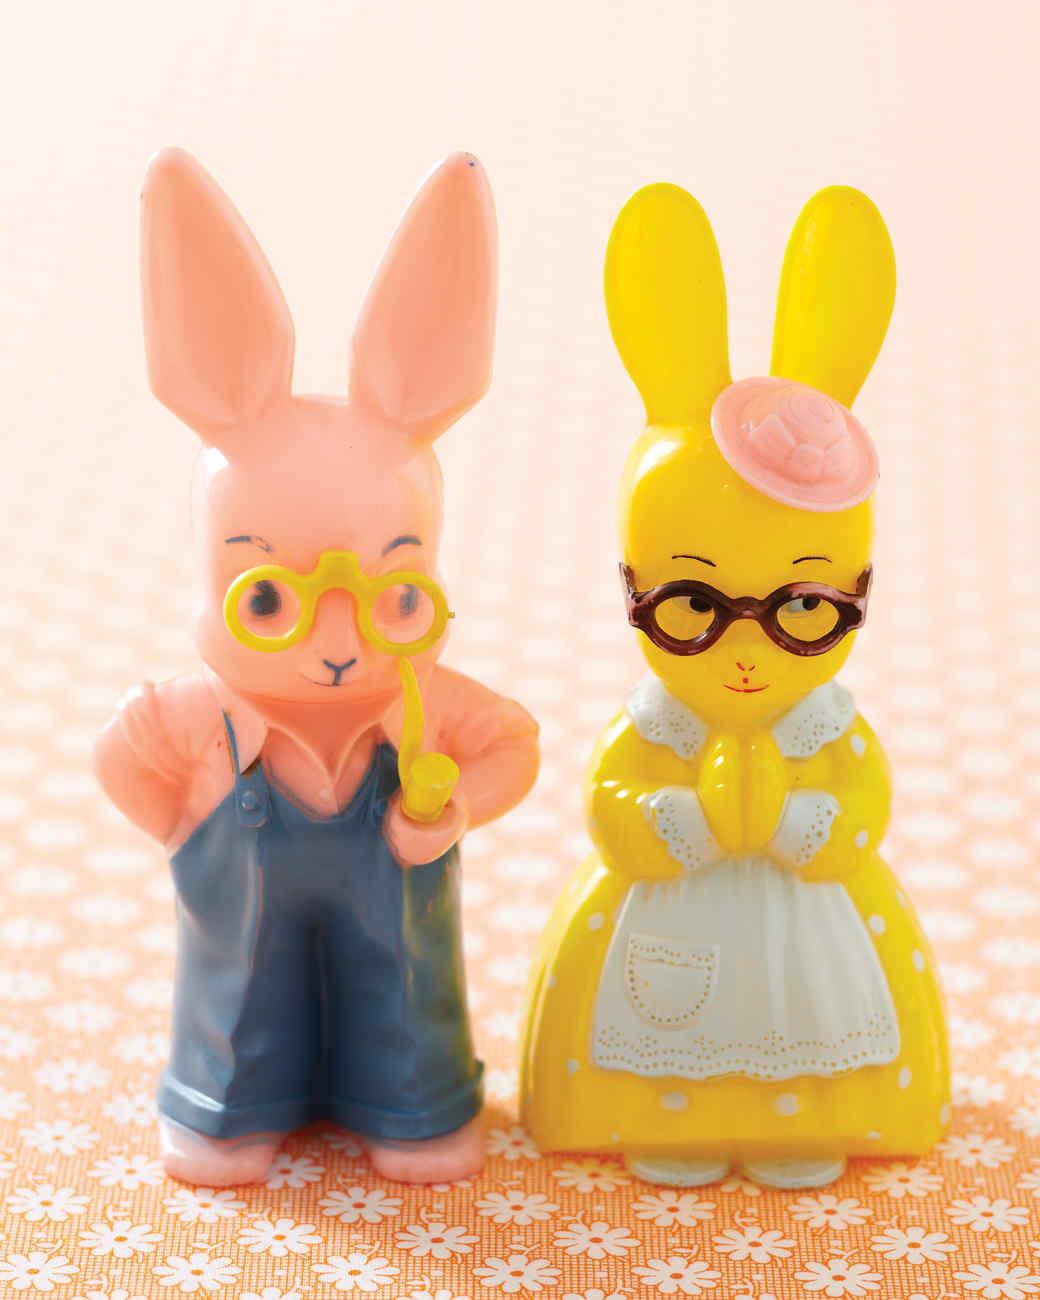 mld106987_0411_bunnies_glossary_886_plastic.jpg